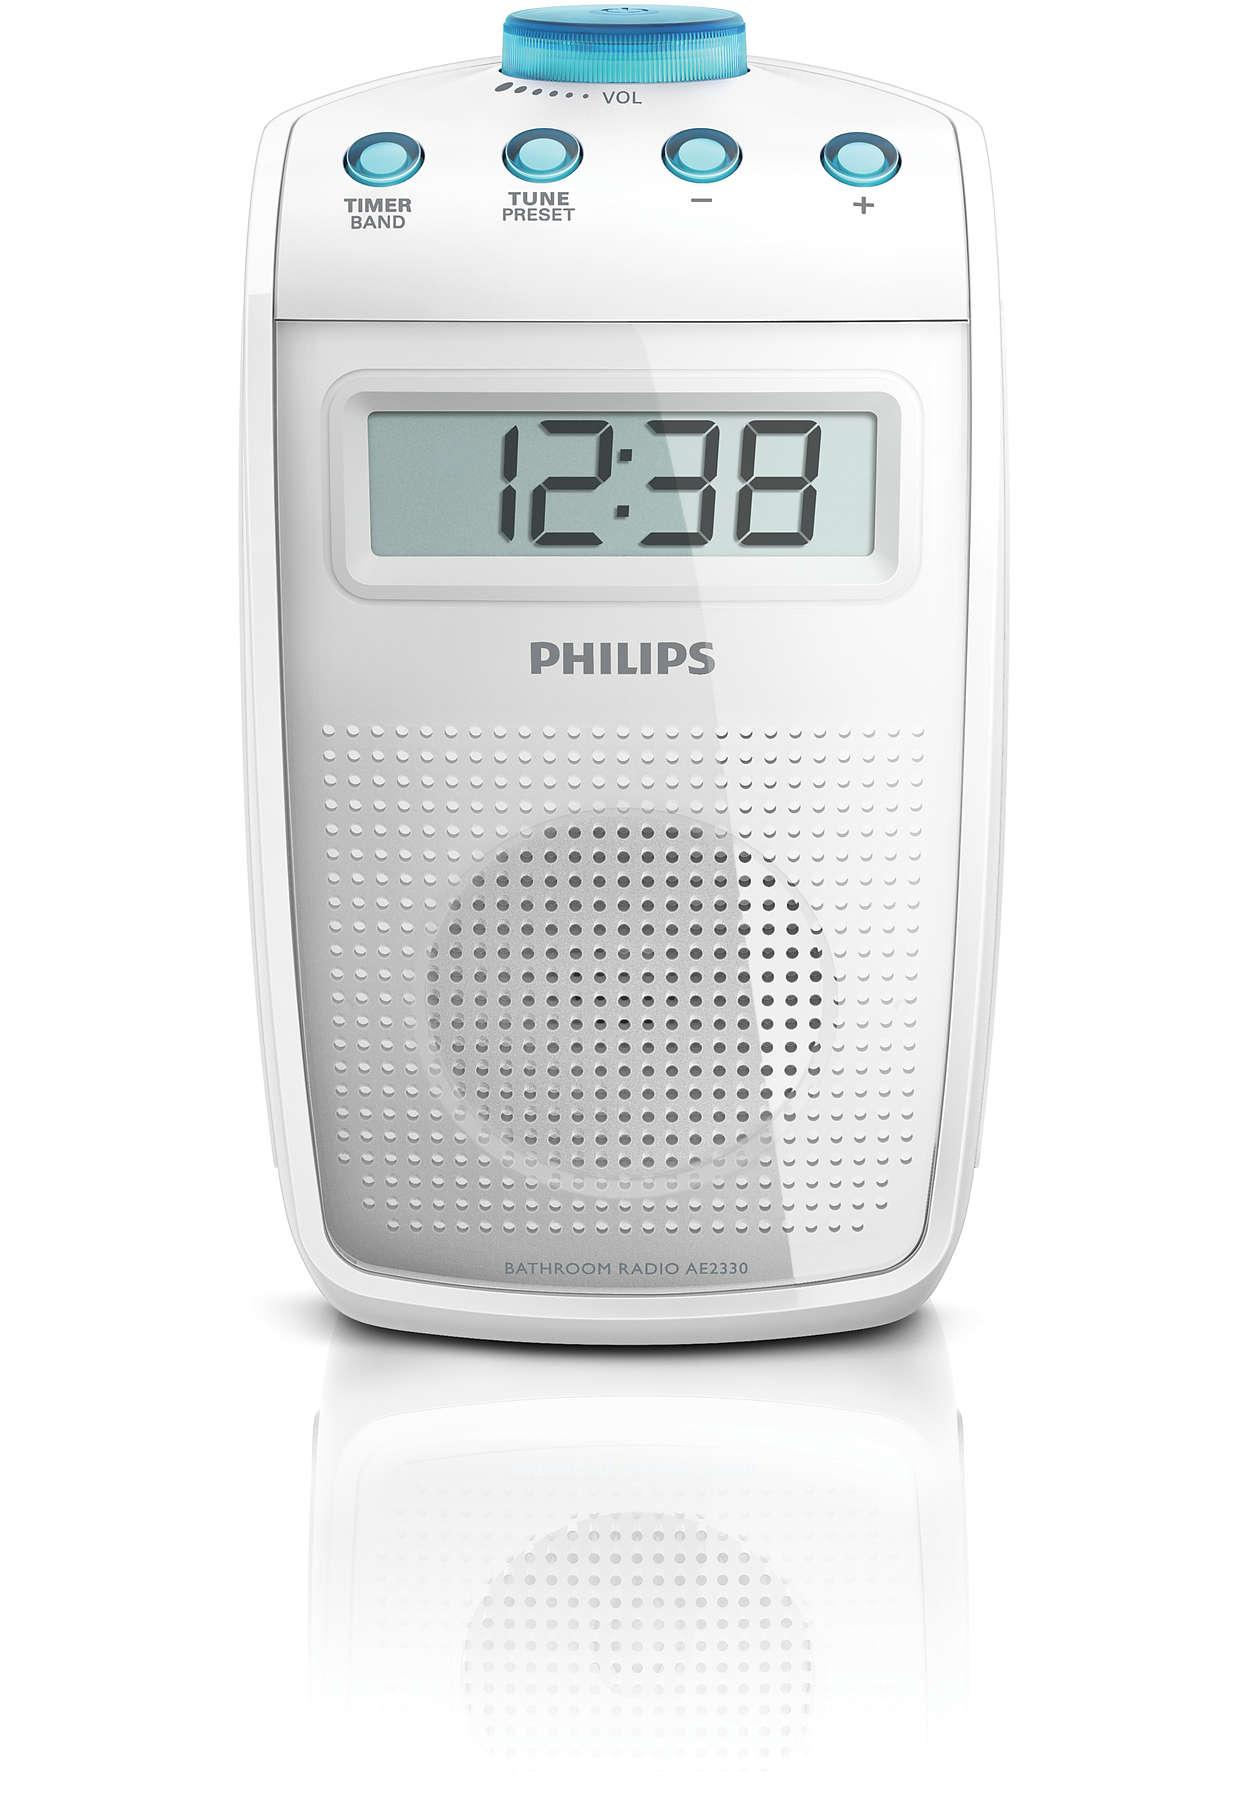 Radio de salle de bains AE2330/00 | Philips